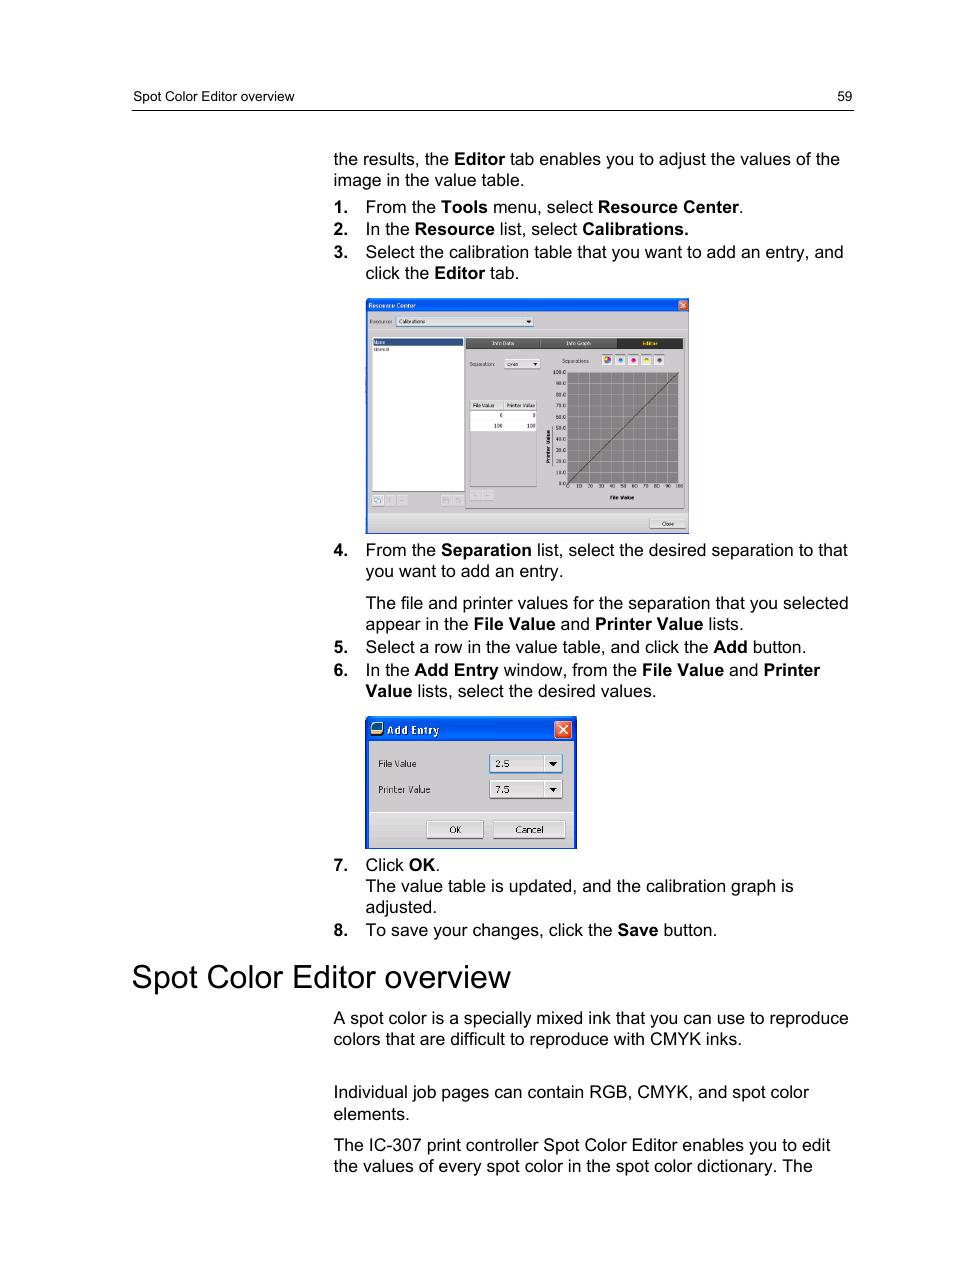 Spot color editor overview | Konica Minolta bizhub PRESS